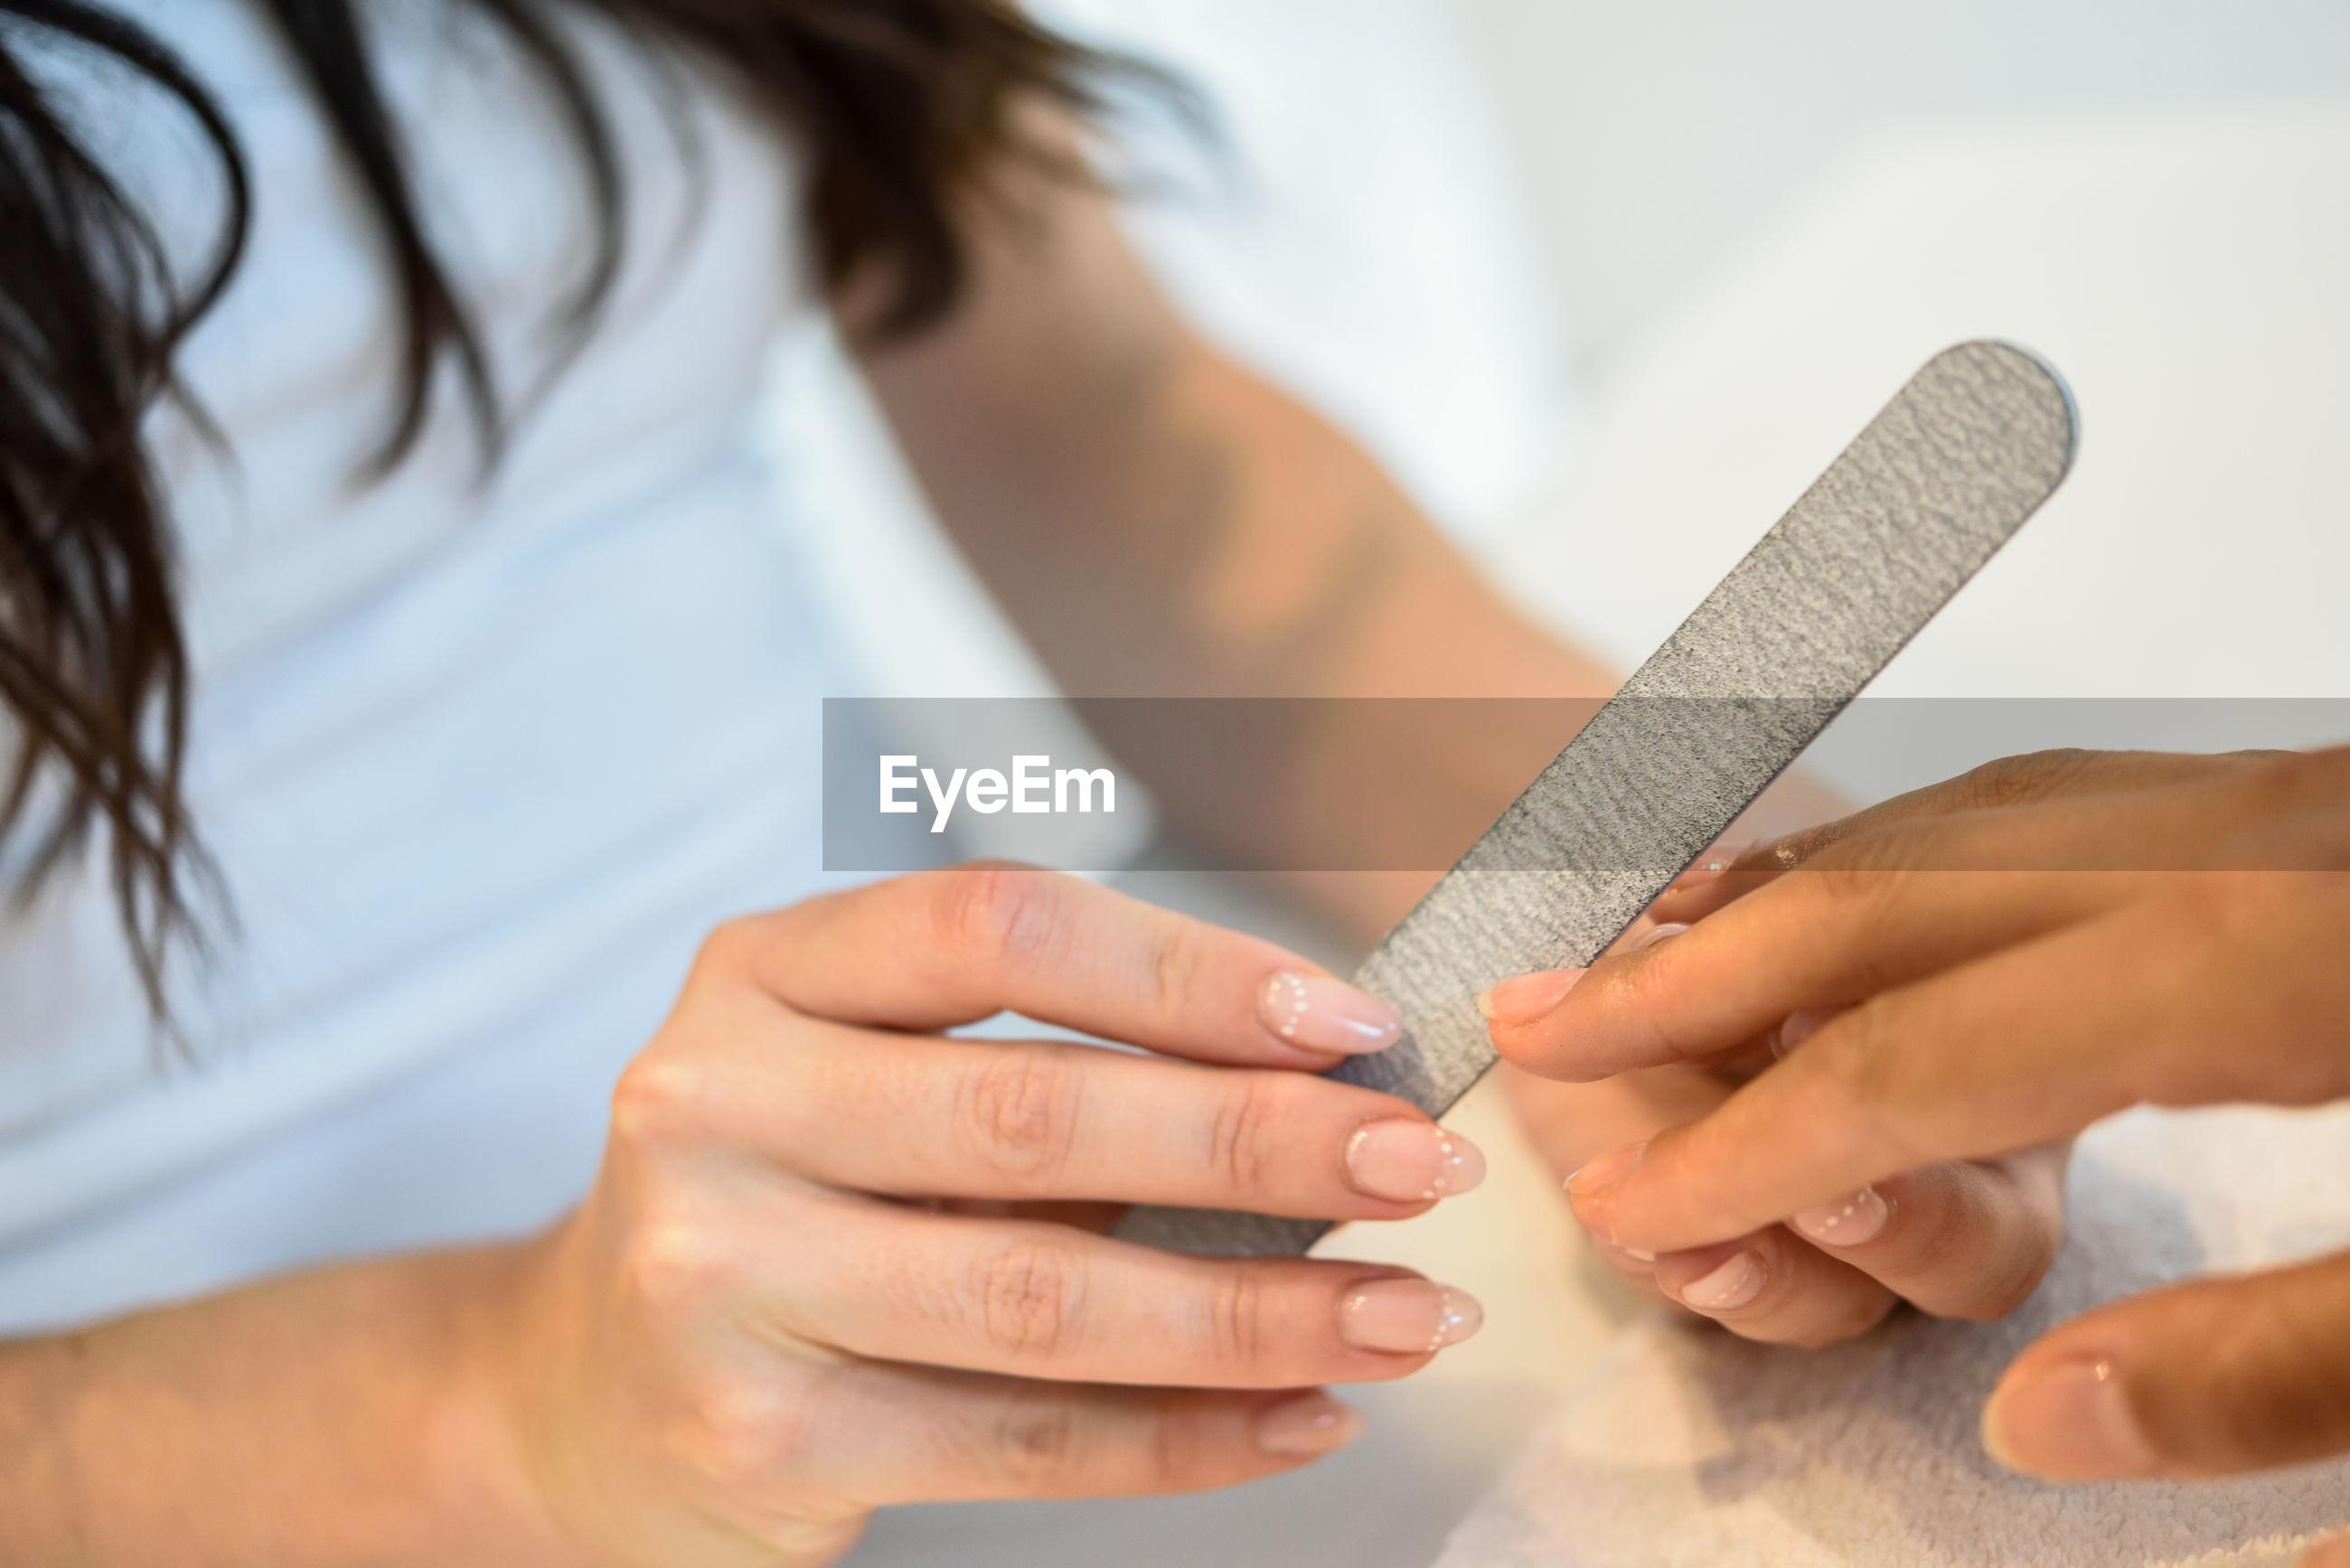 Midsection of woman filing fingernails at nail salon